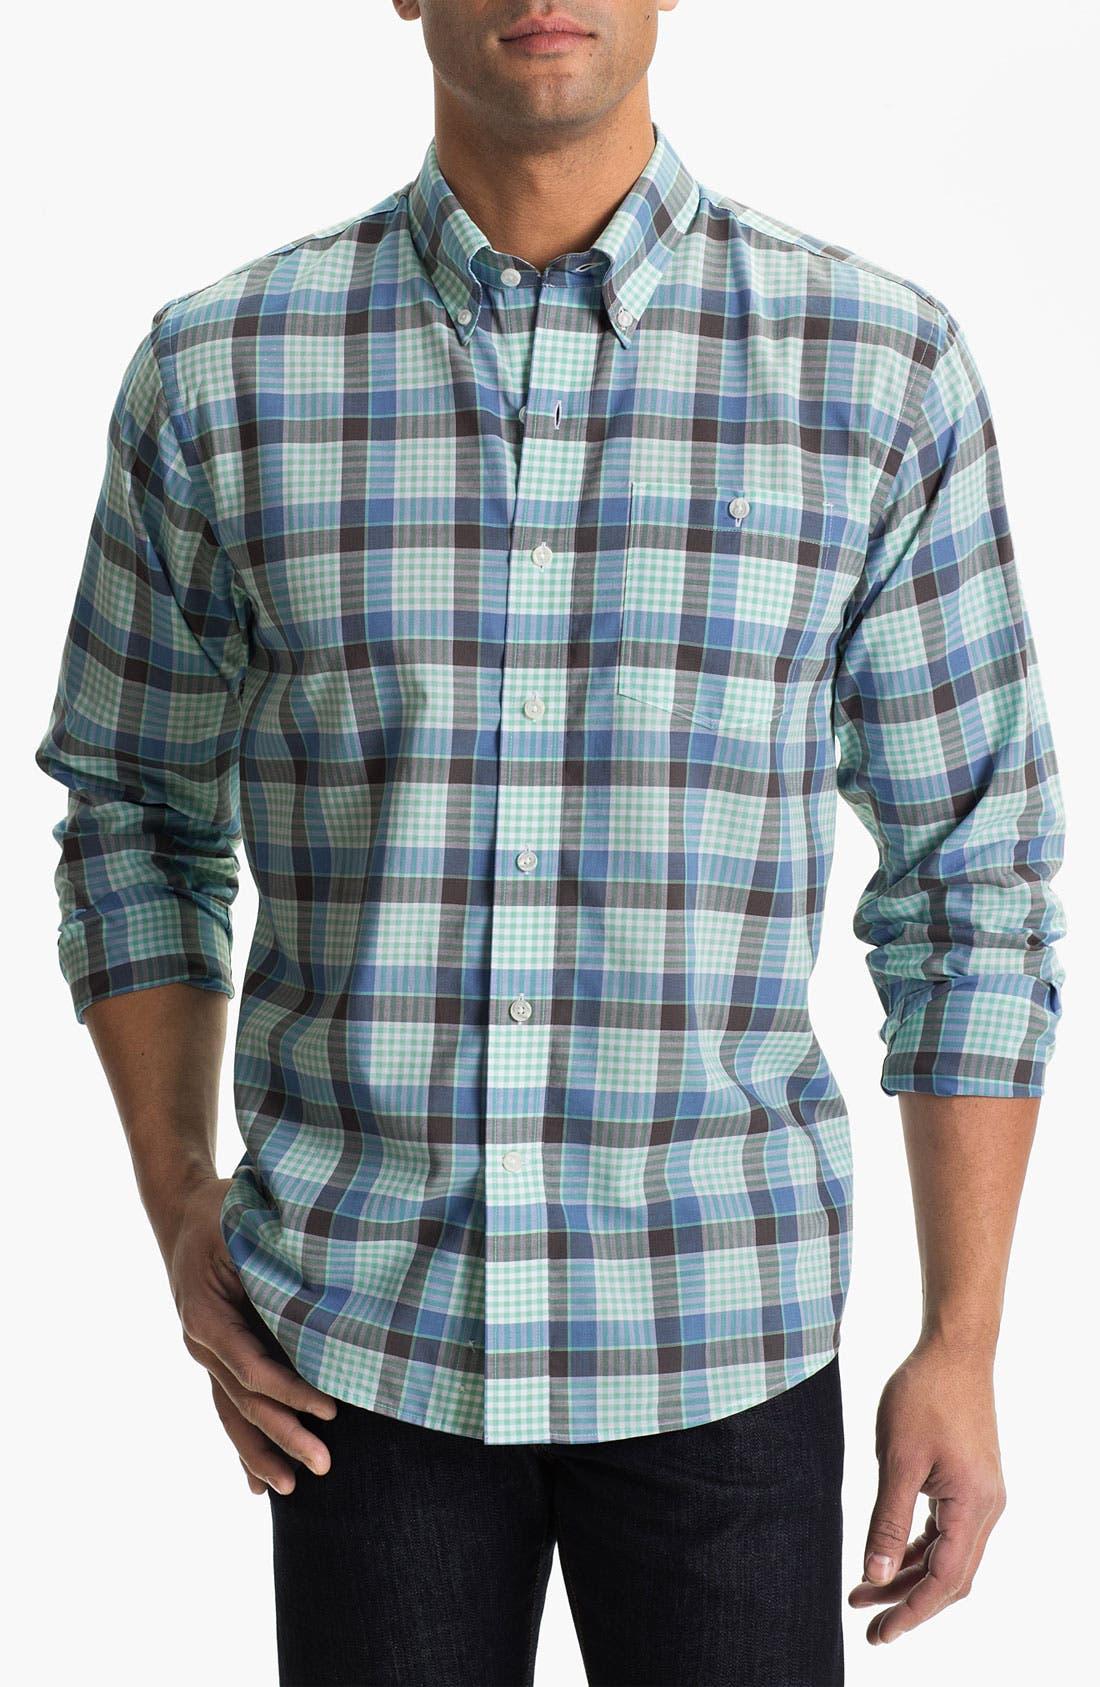 Alternate Image 1 Selected - Cutter & Buck 'Tabor Plaid' Regular Fit Sport Shirt